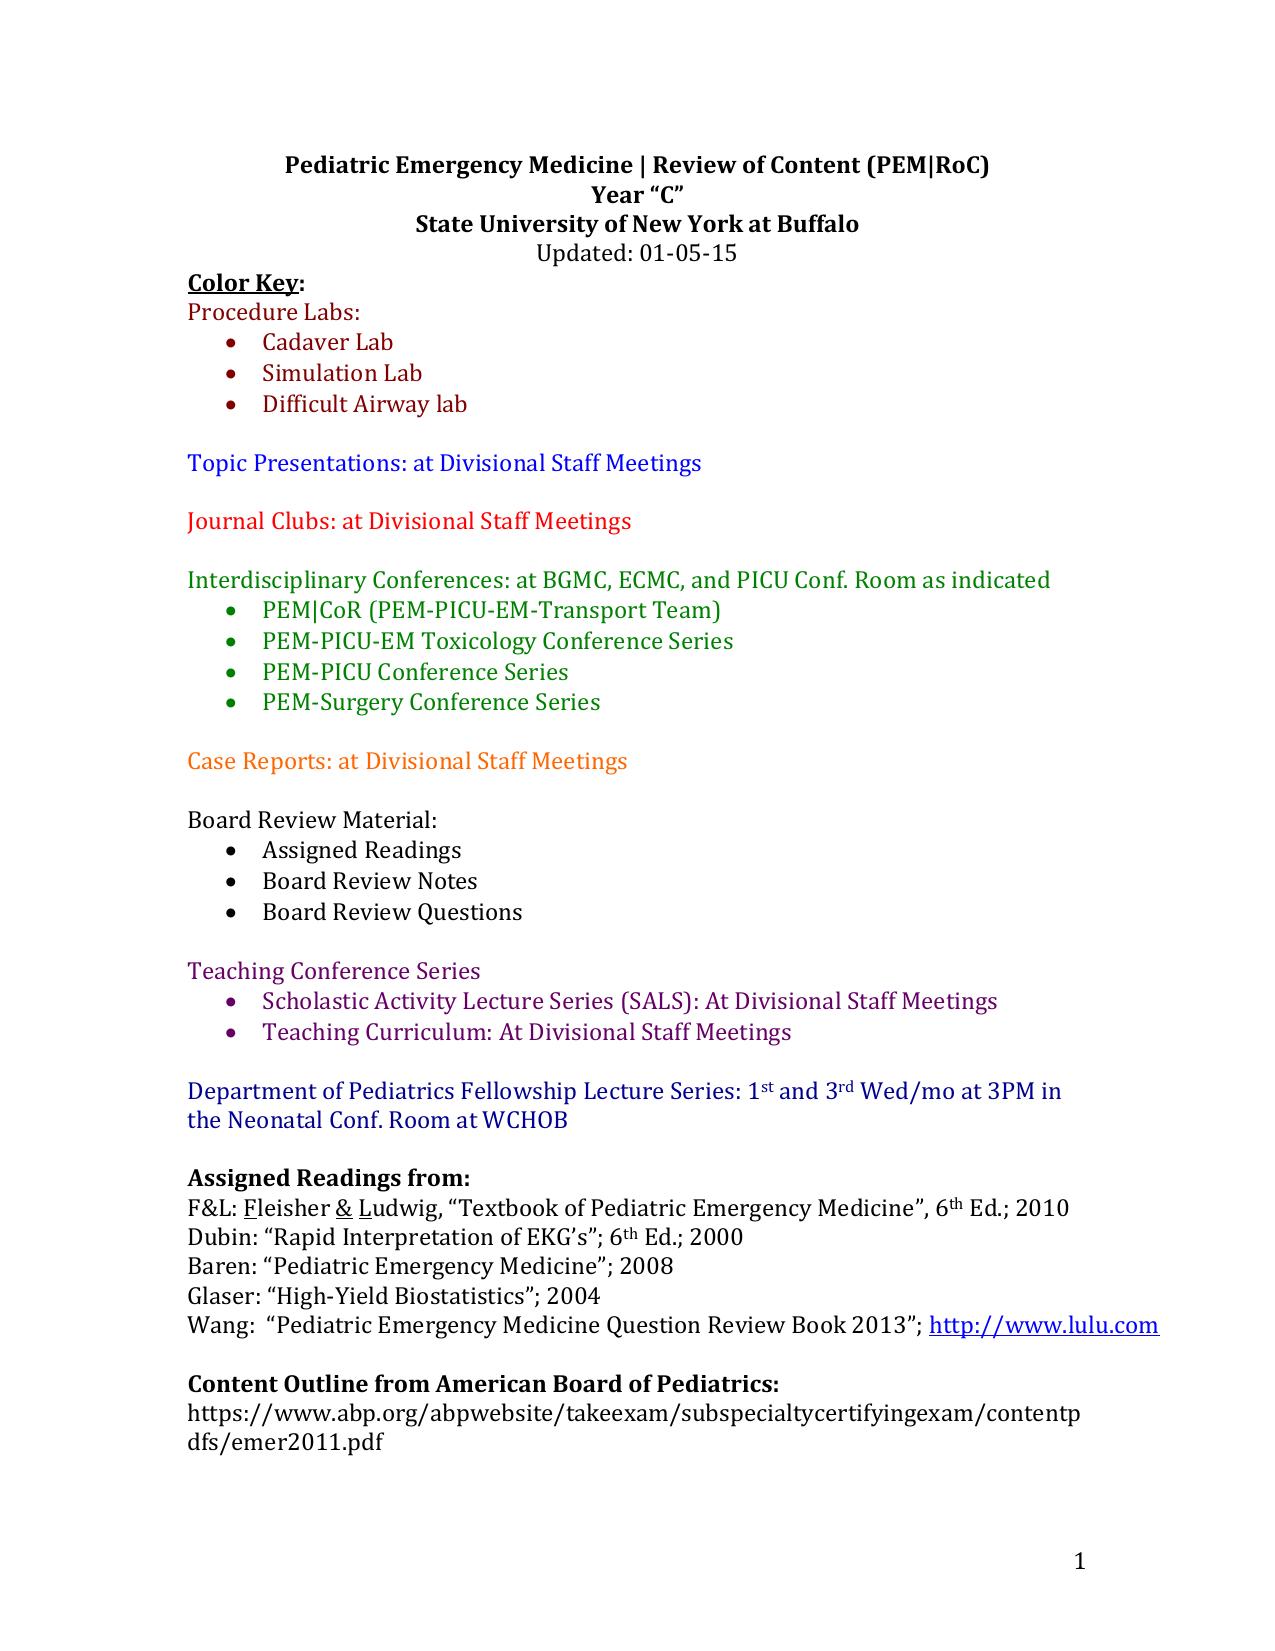 Biostatistics pdf yield high